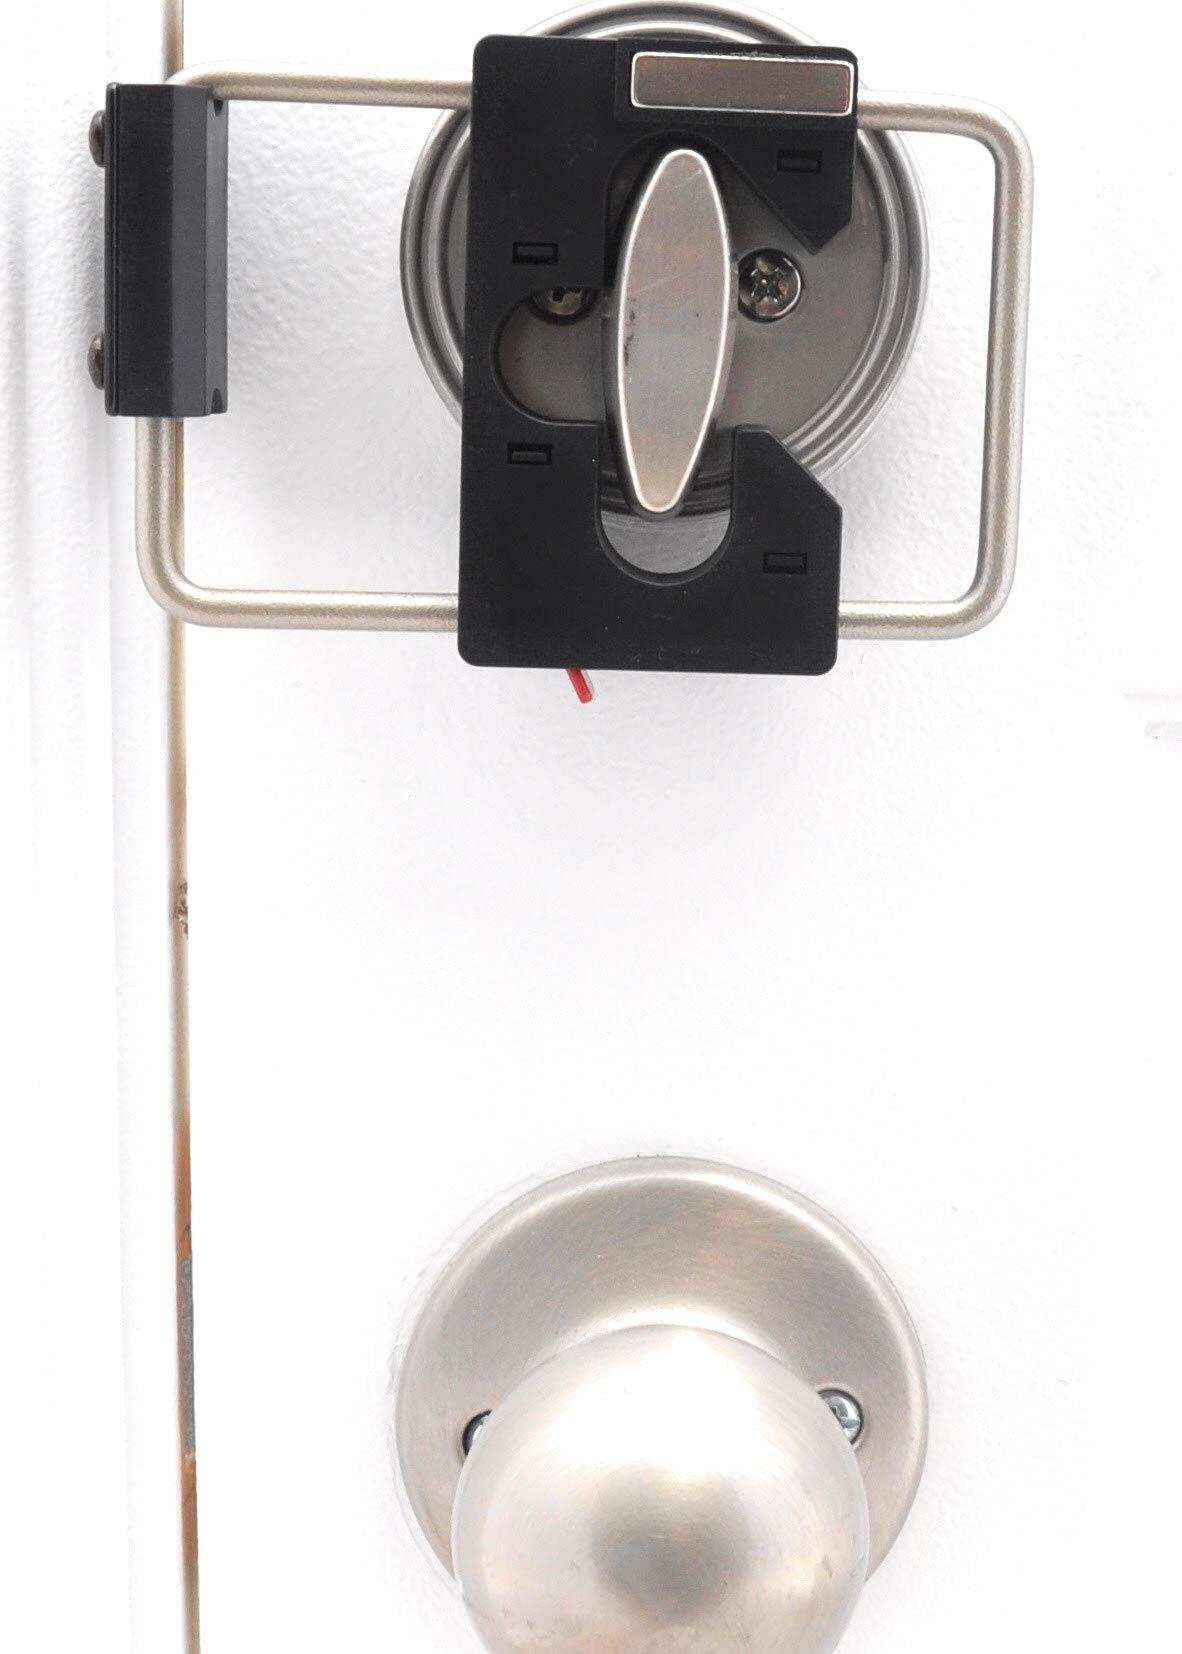 LOKmate Deadbolt Guard Door Lock Security - Magnet Version (Black/Satin Nickel)